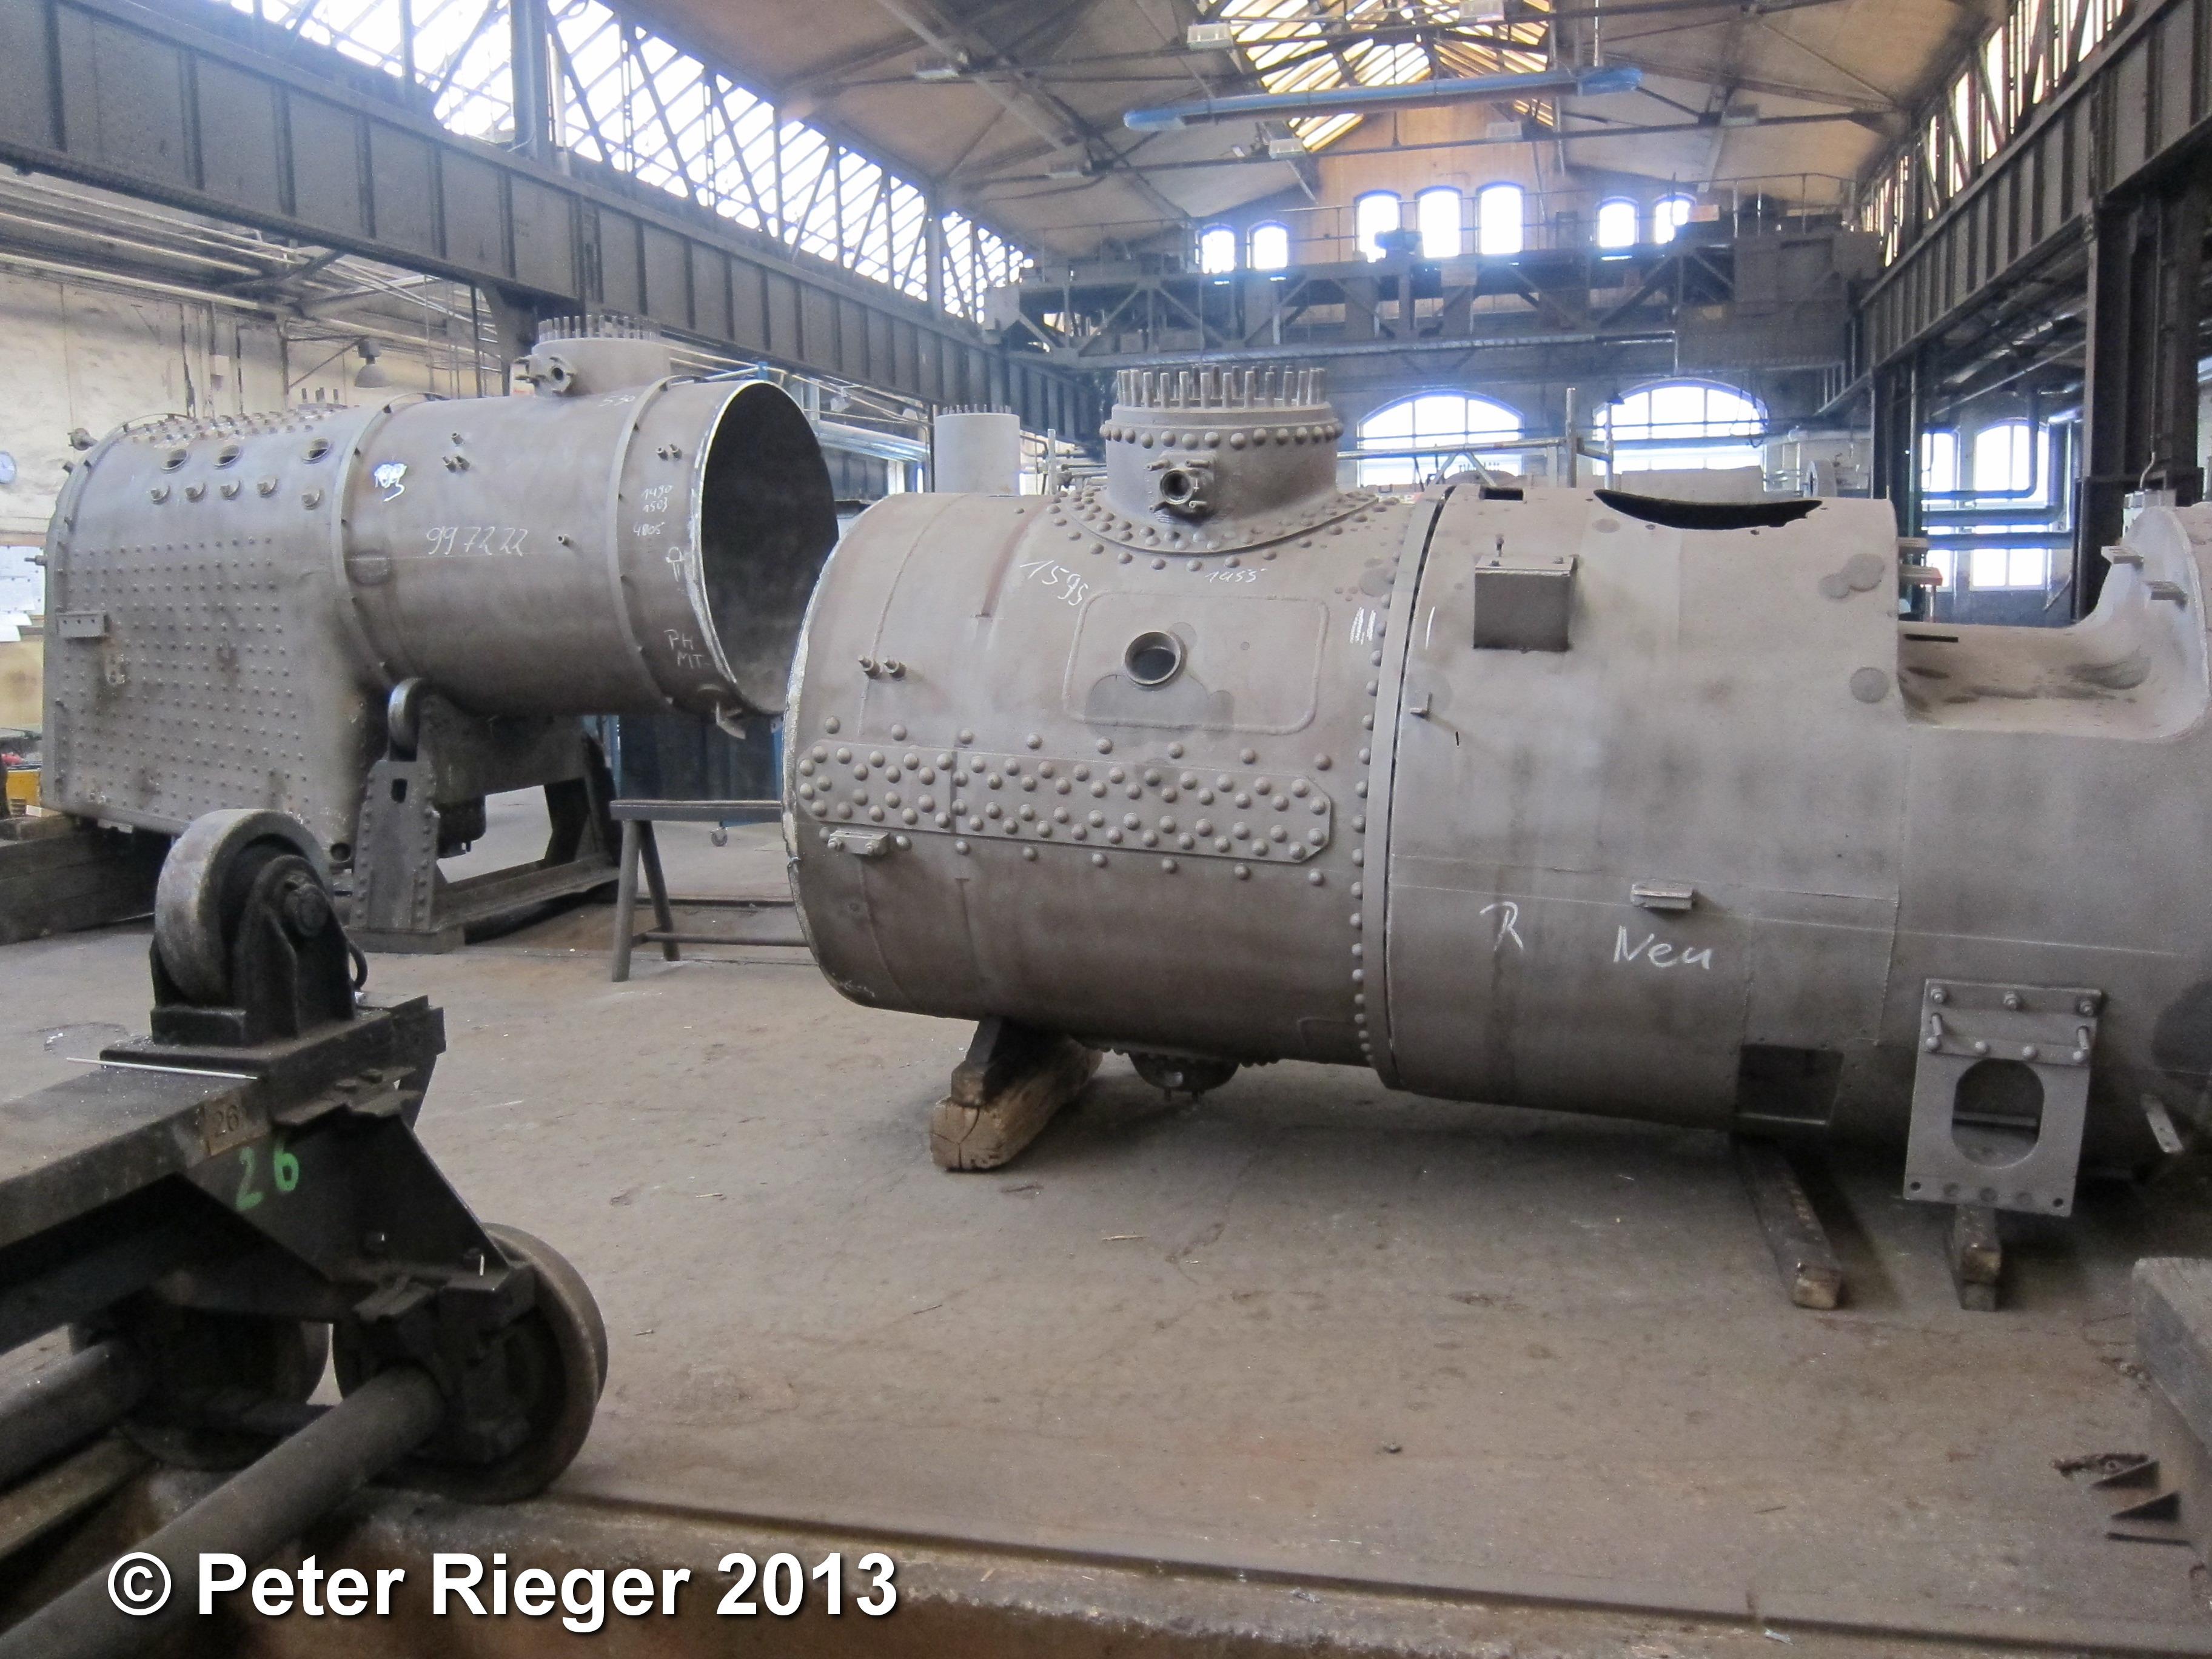 Datei:Dampfkesselerneuerung Schmalspurlok 99 222.jpg – Wikipedia